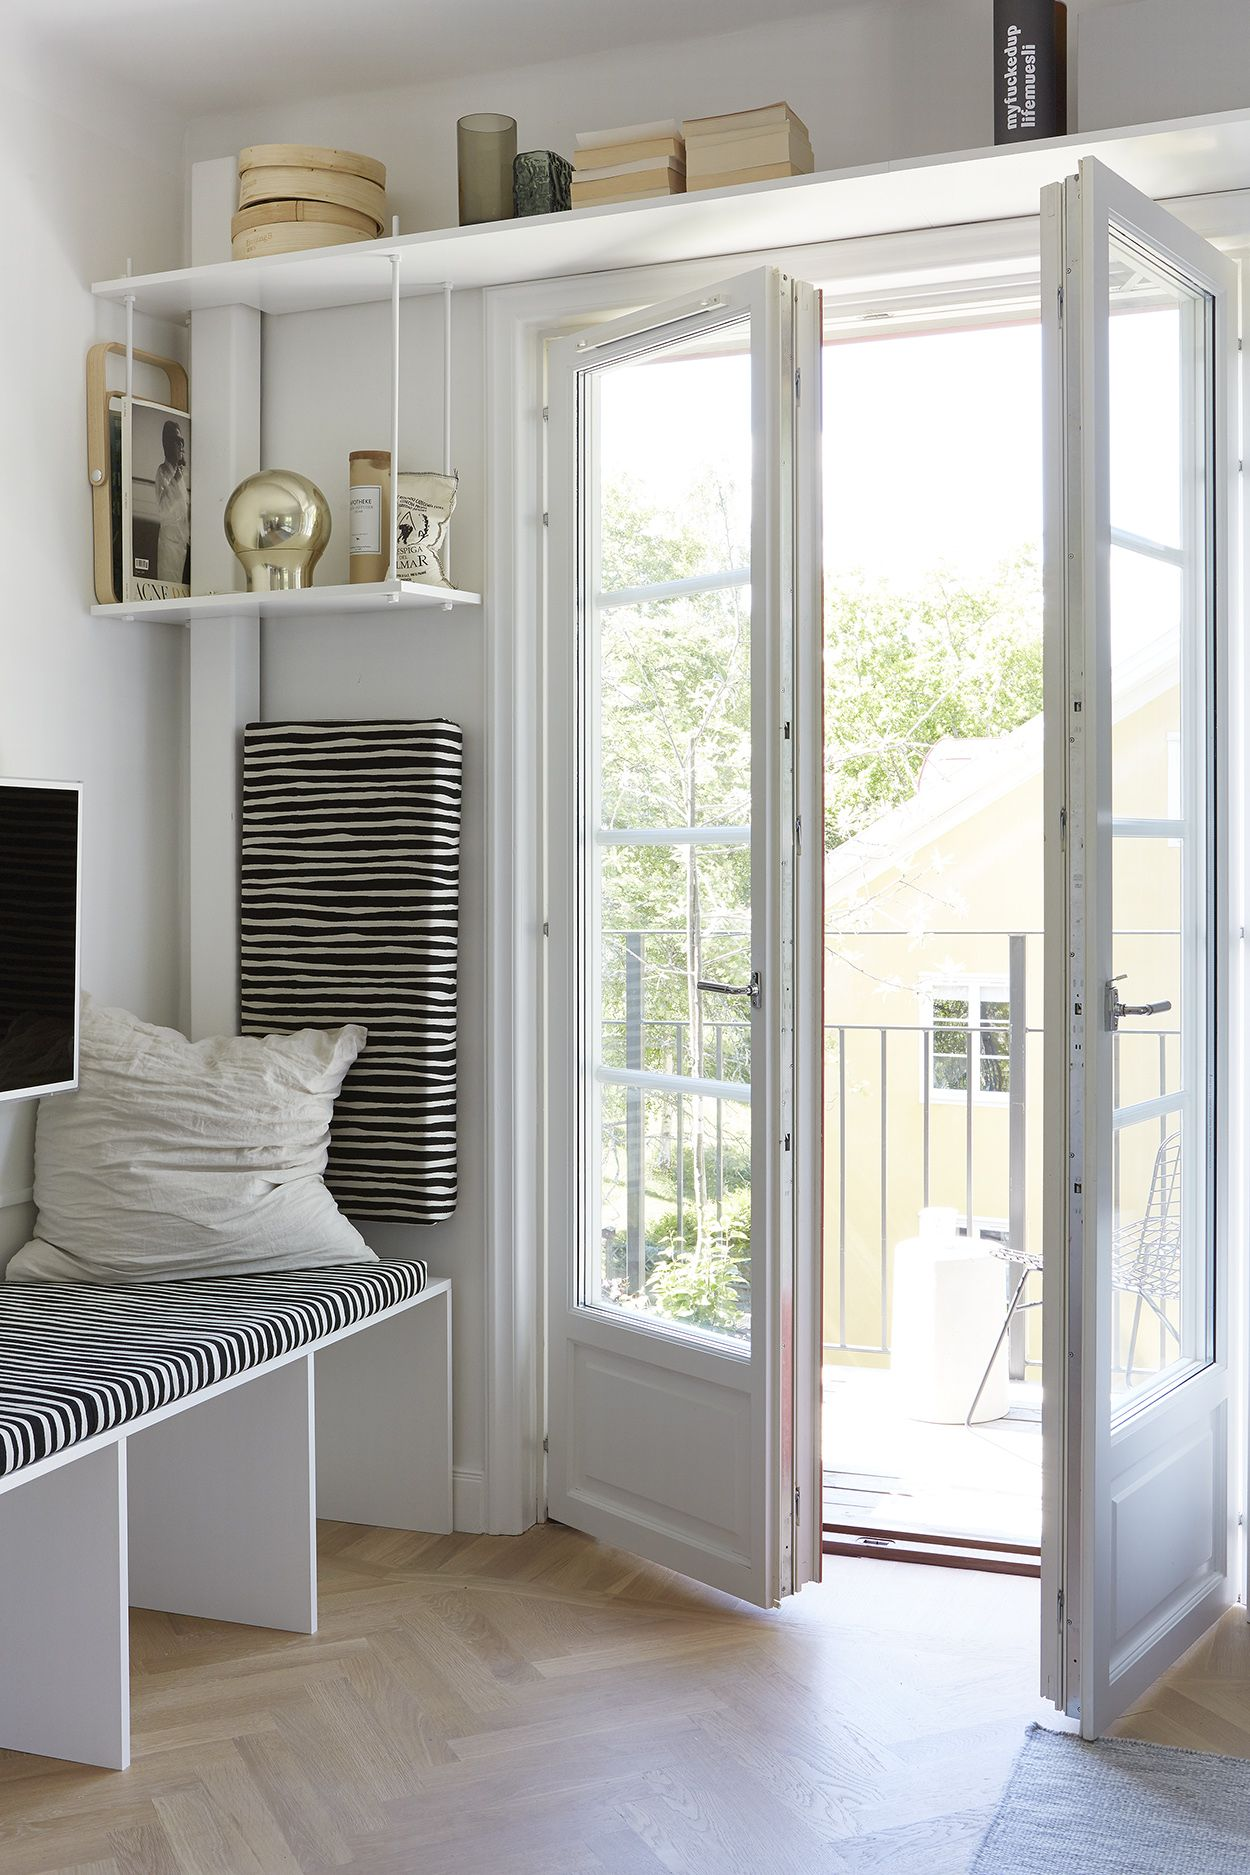 30 Diy Storage Ideas Easy Home Storage Solutions